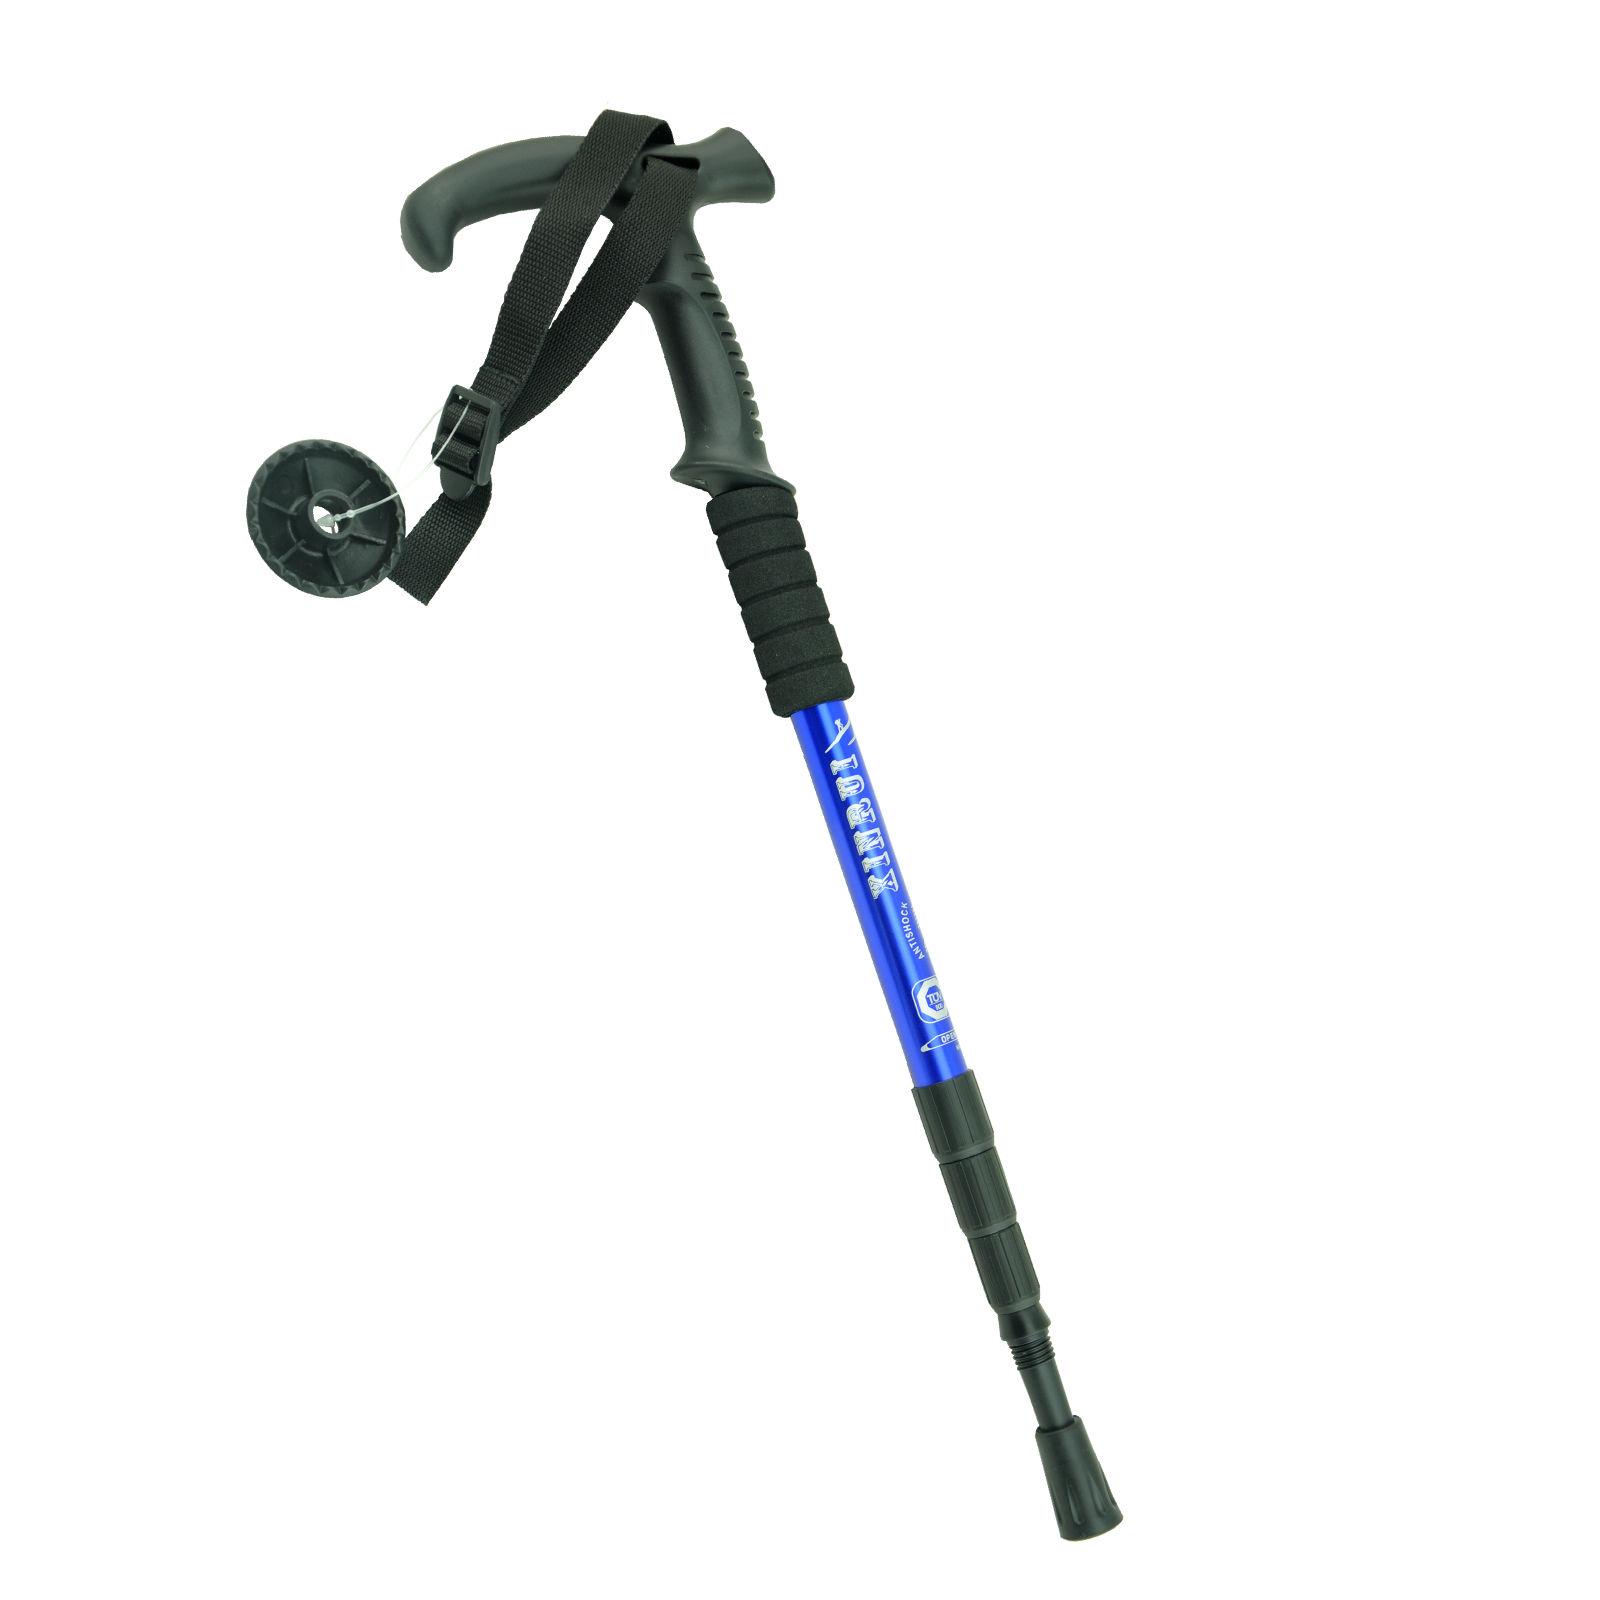 Telescopic Trekking Walking Hiking Sticks Poles Adjustable